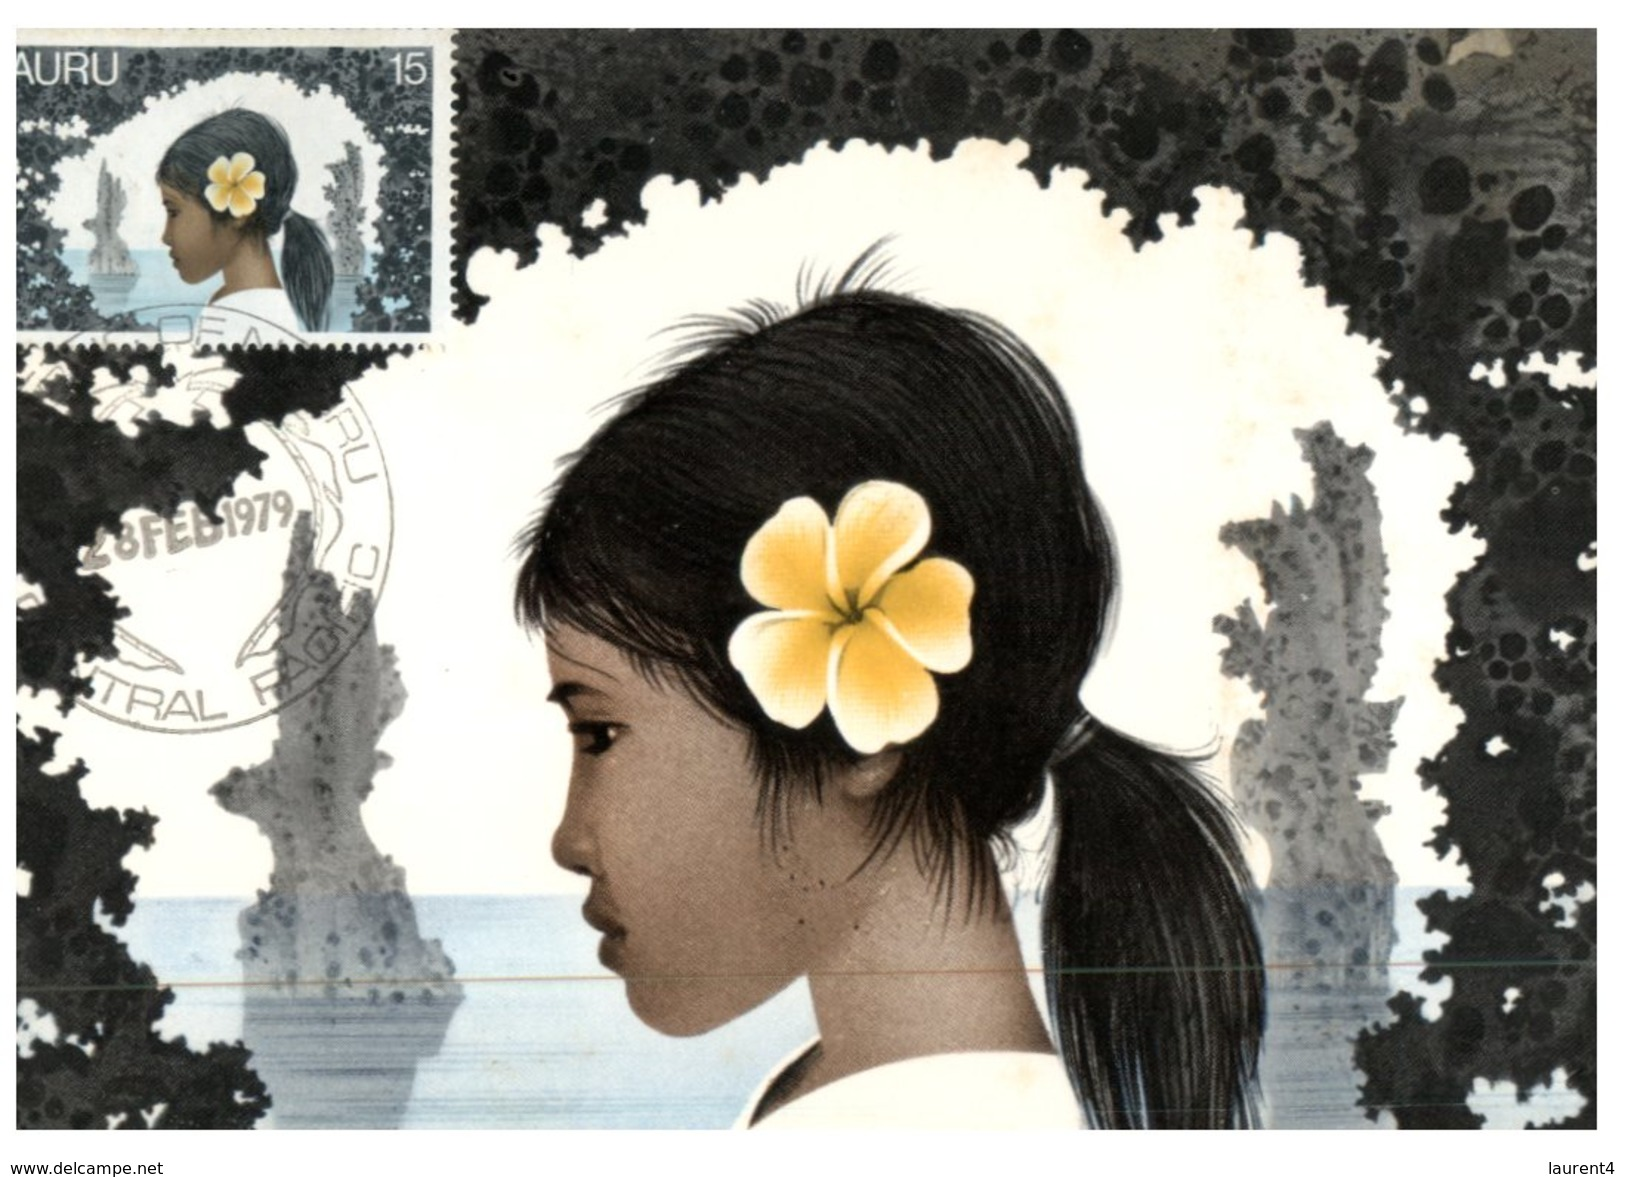 (3000) Nauru - Young Girl - Nauru